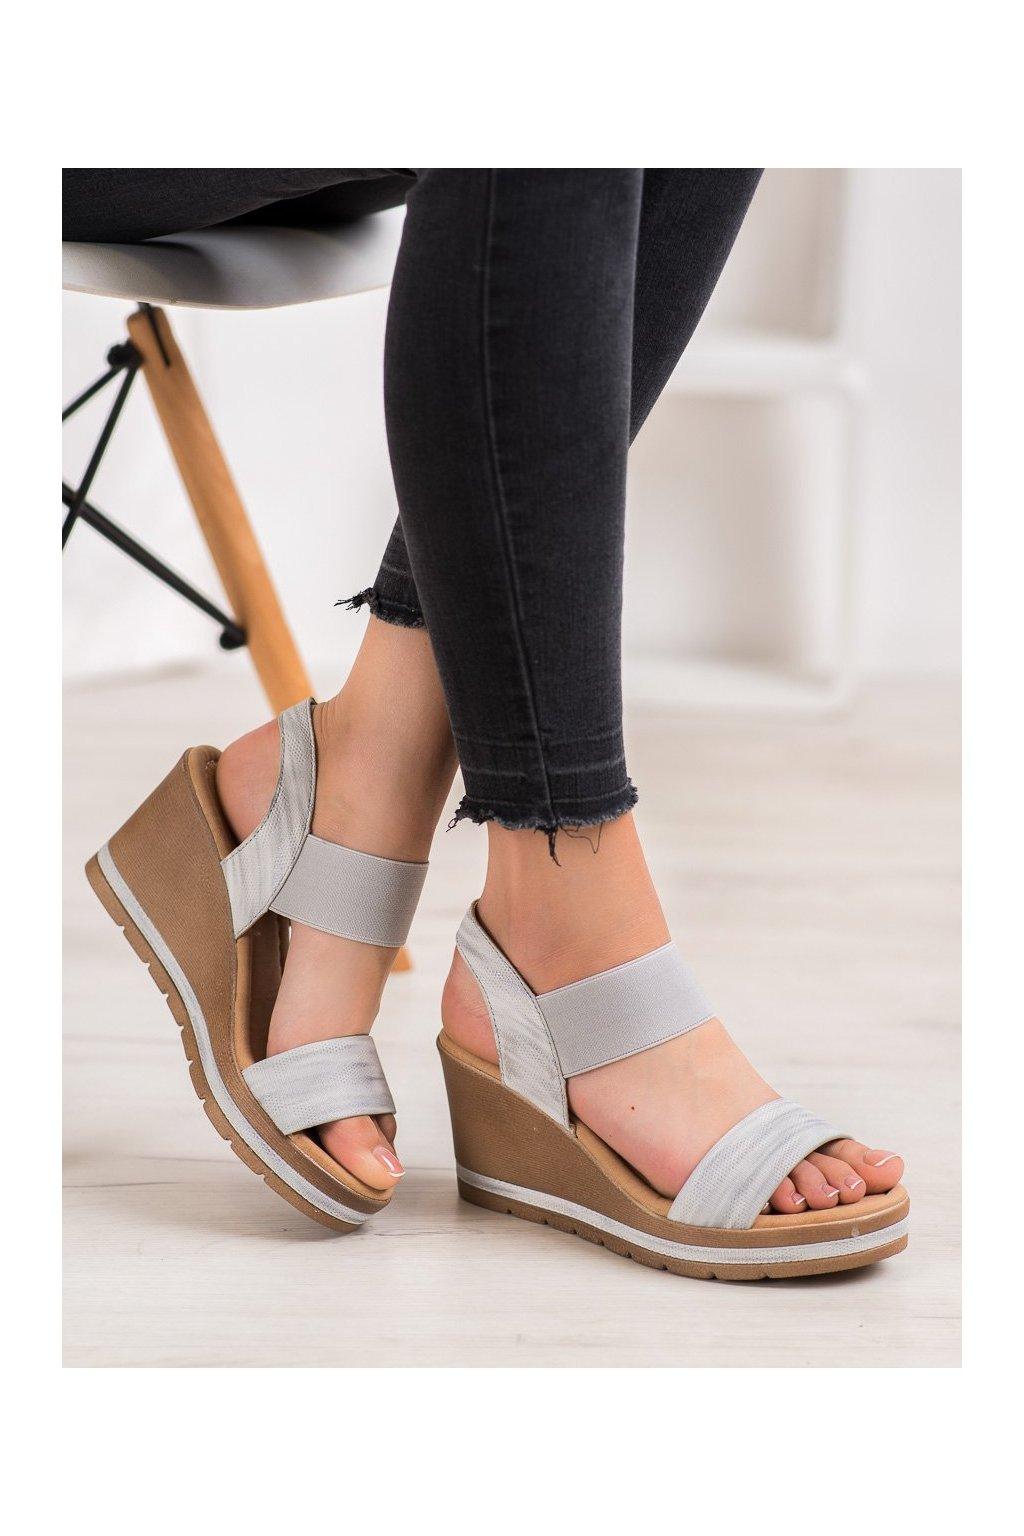 Sivé dámske sandále Sea elves kod 6436S